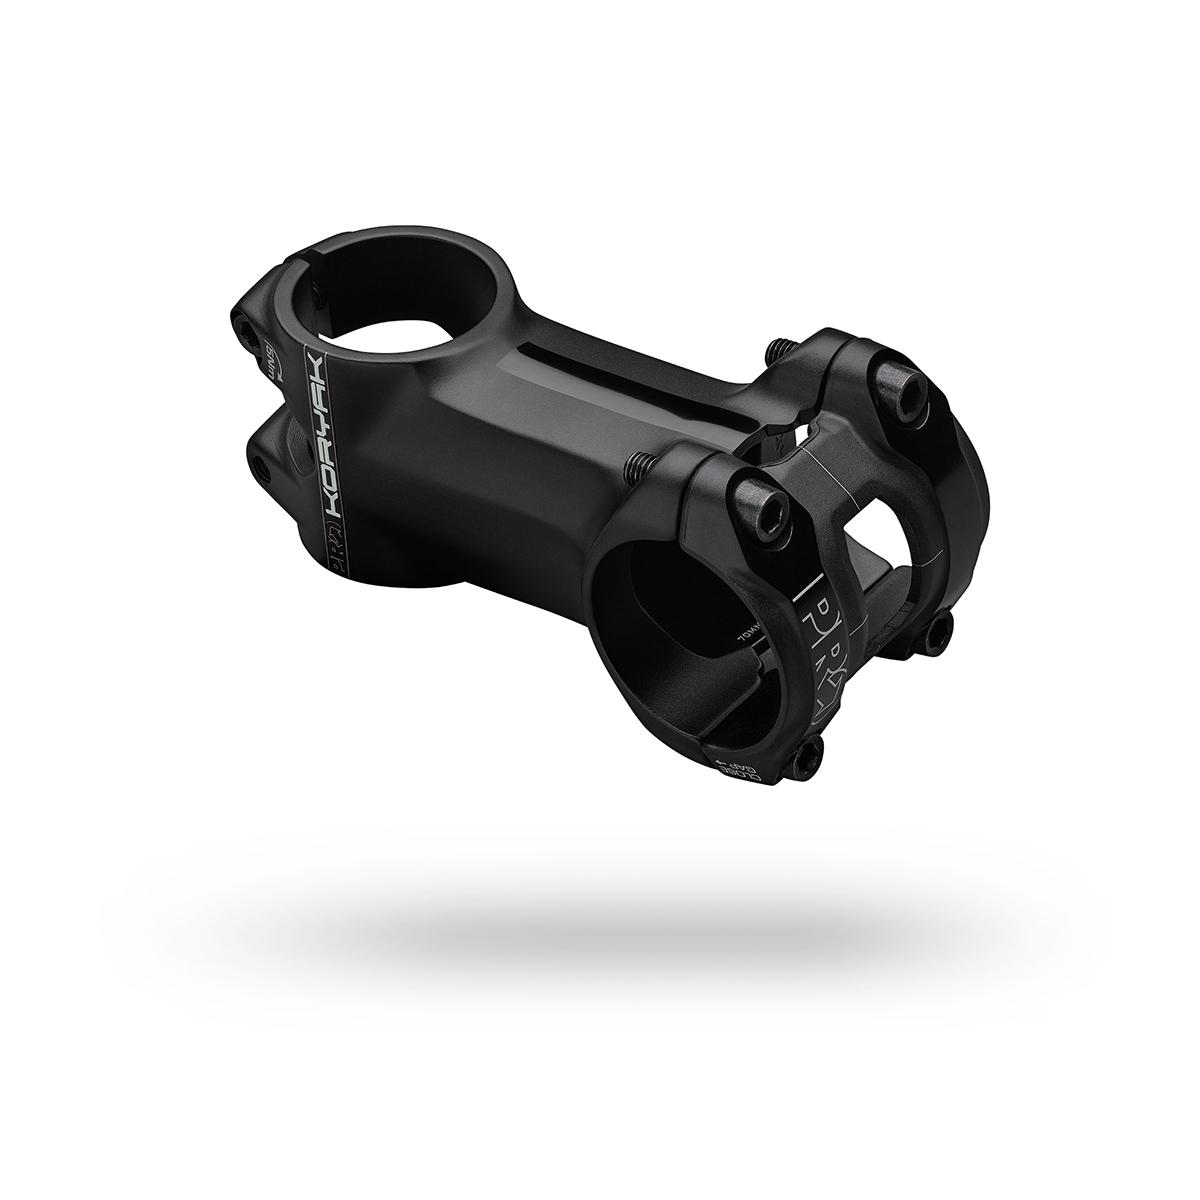 Stem Koryak 31.8mm x 80mm +/-6° Black